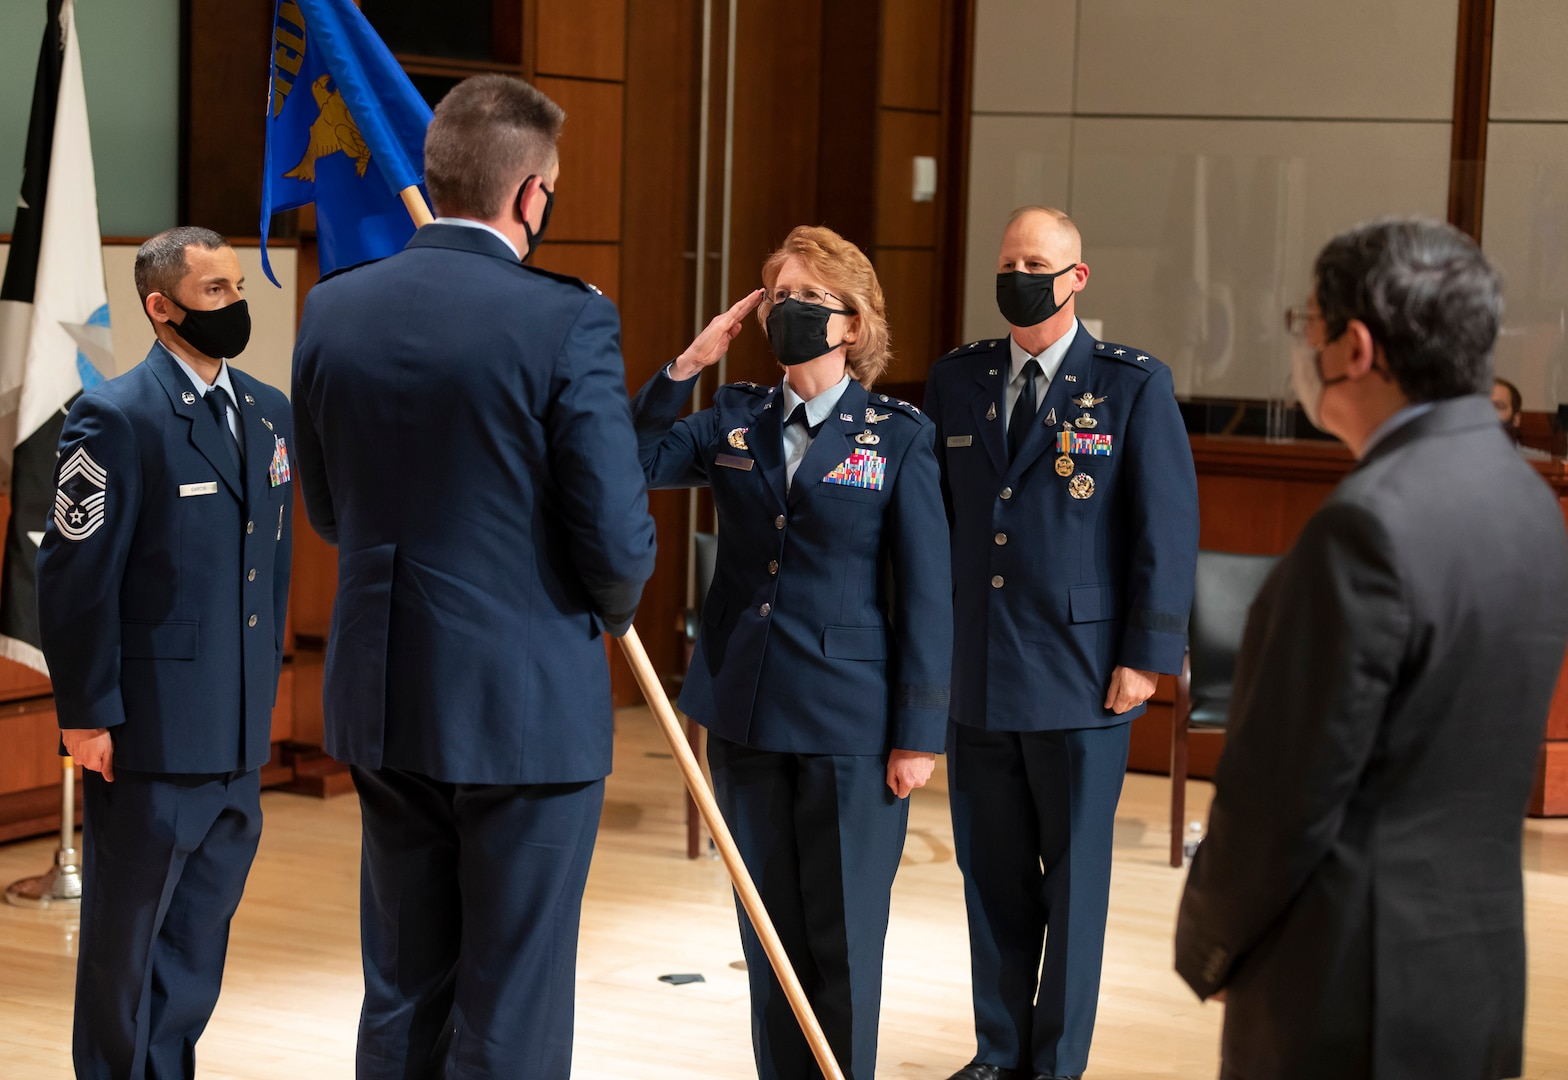 NRO welcomes new deputy director, Maj. Gen. Donna Shipton